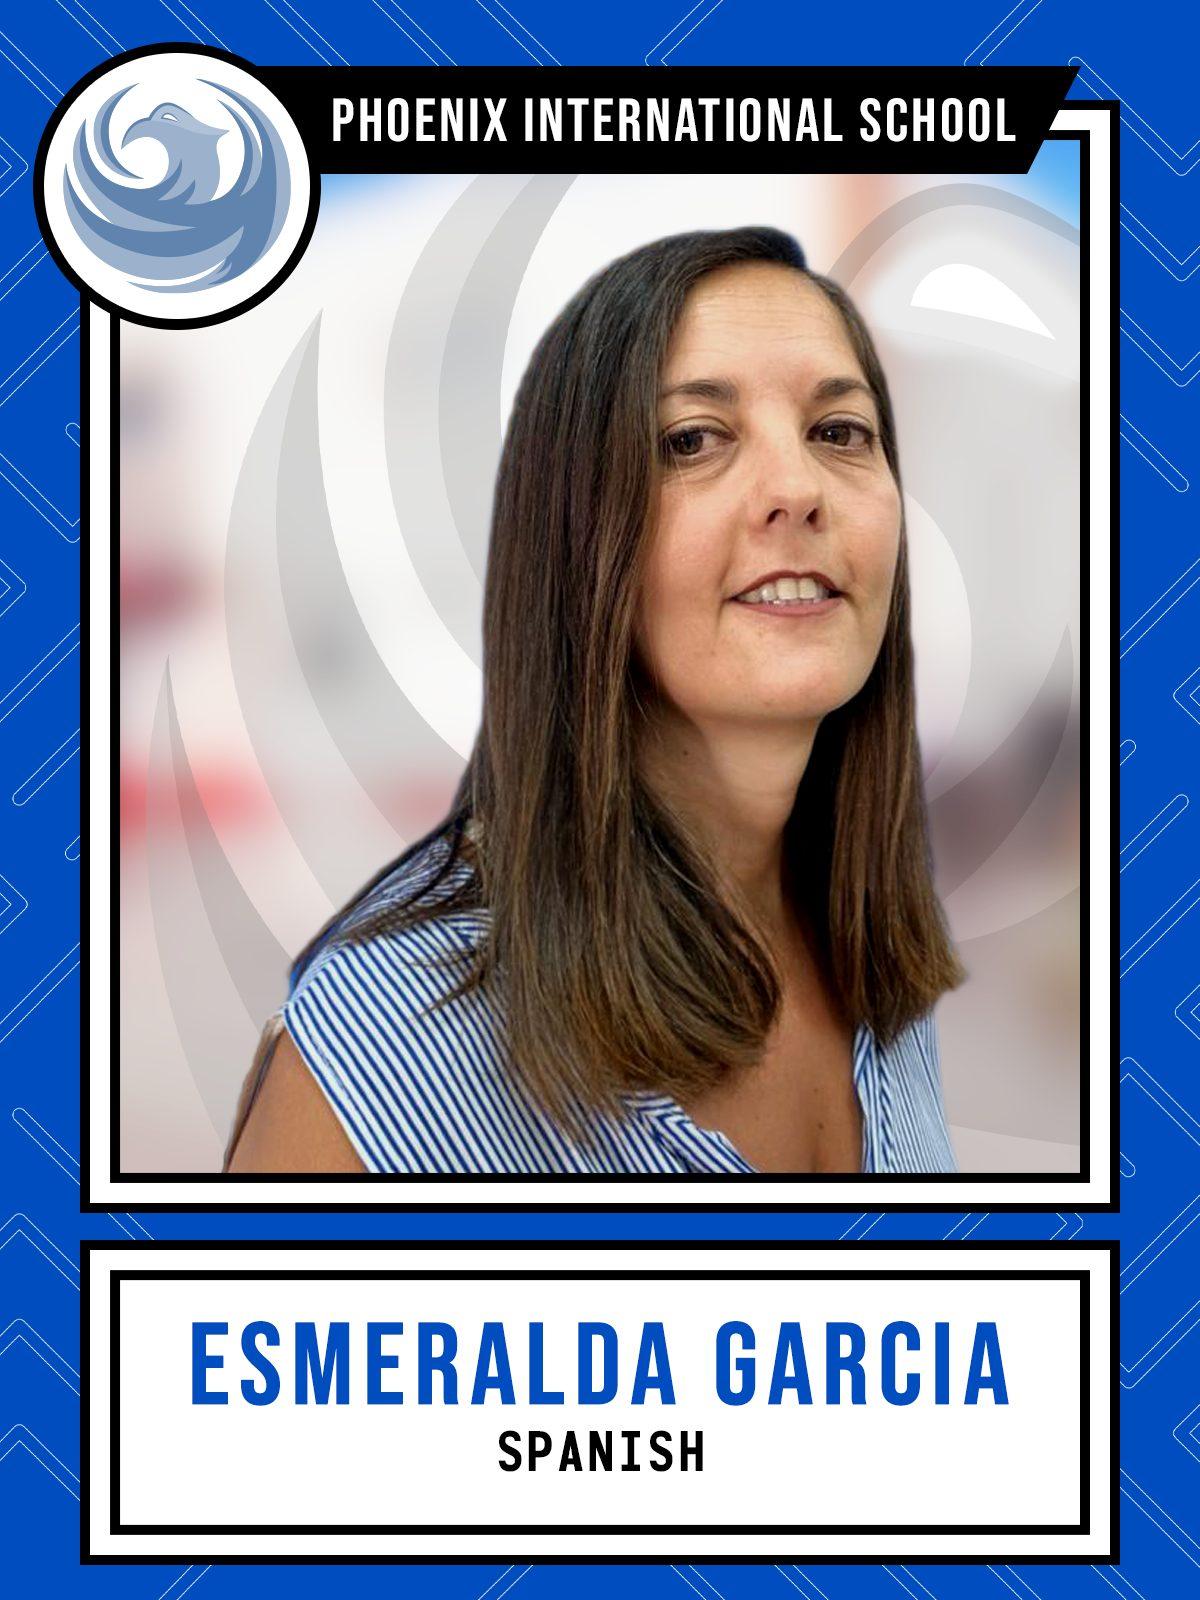 Esmeralda Garcia - Spanish